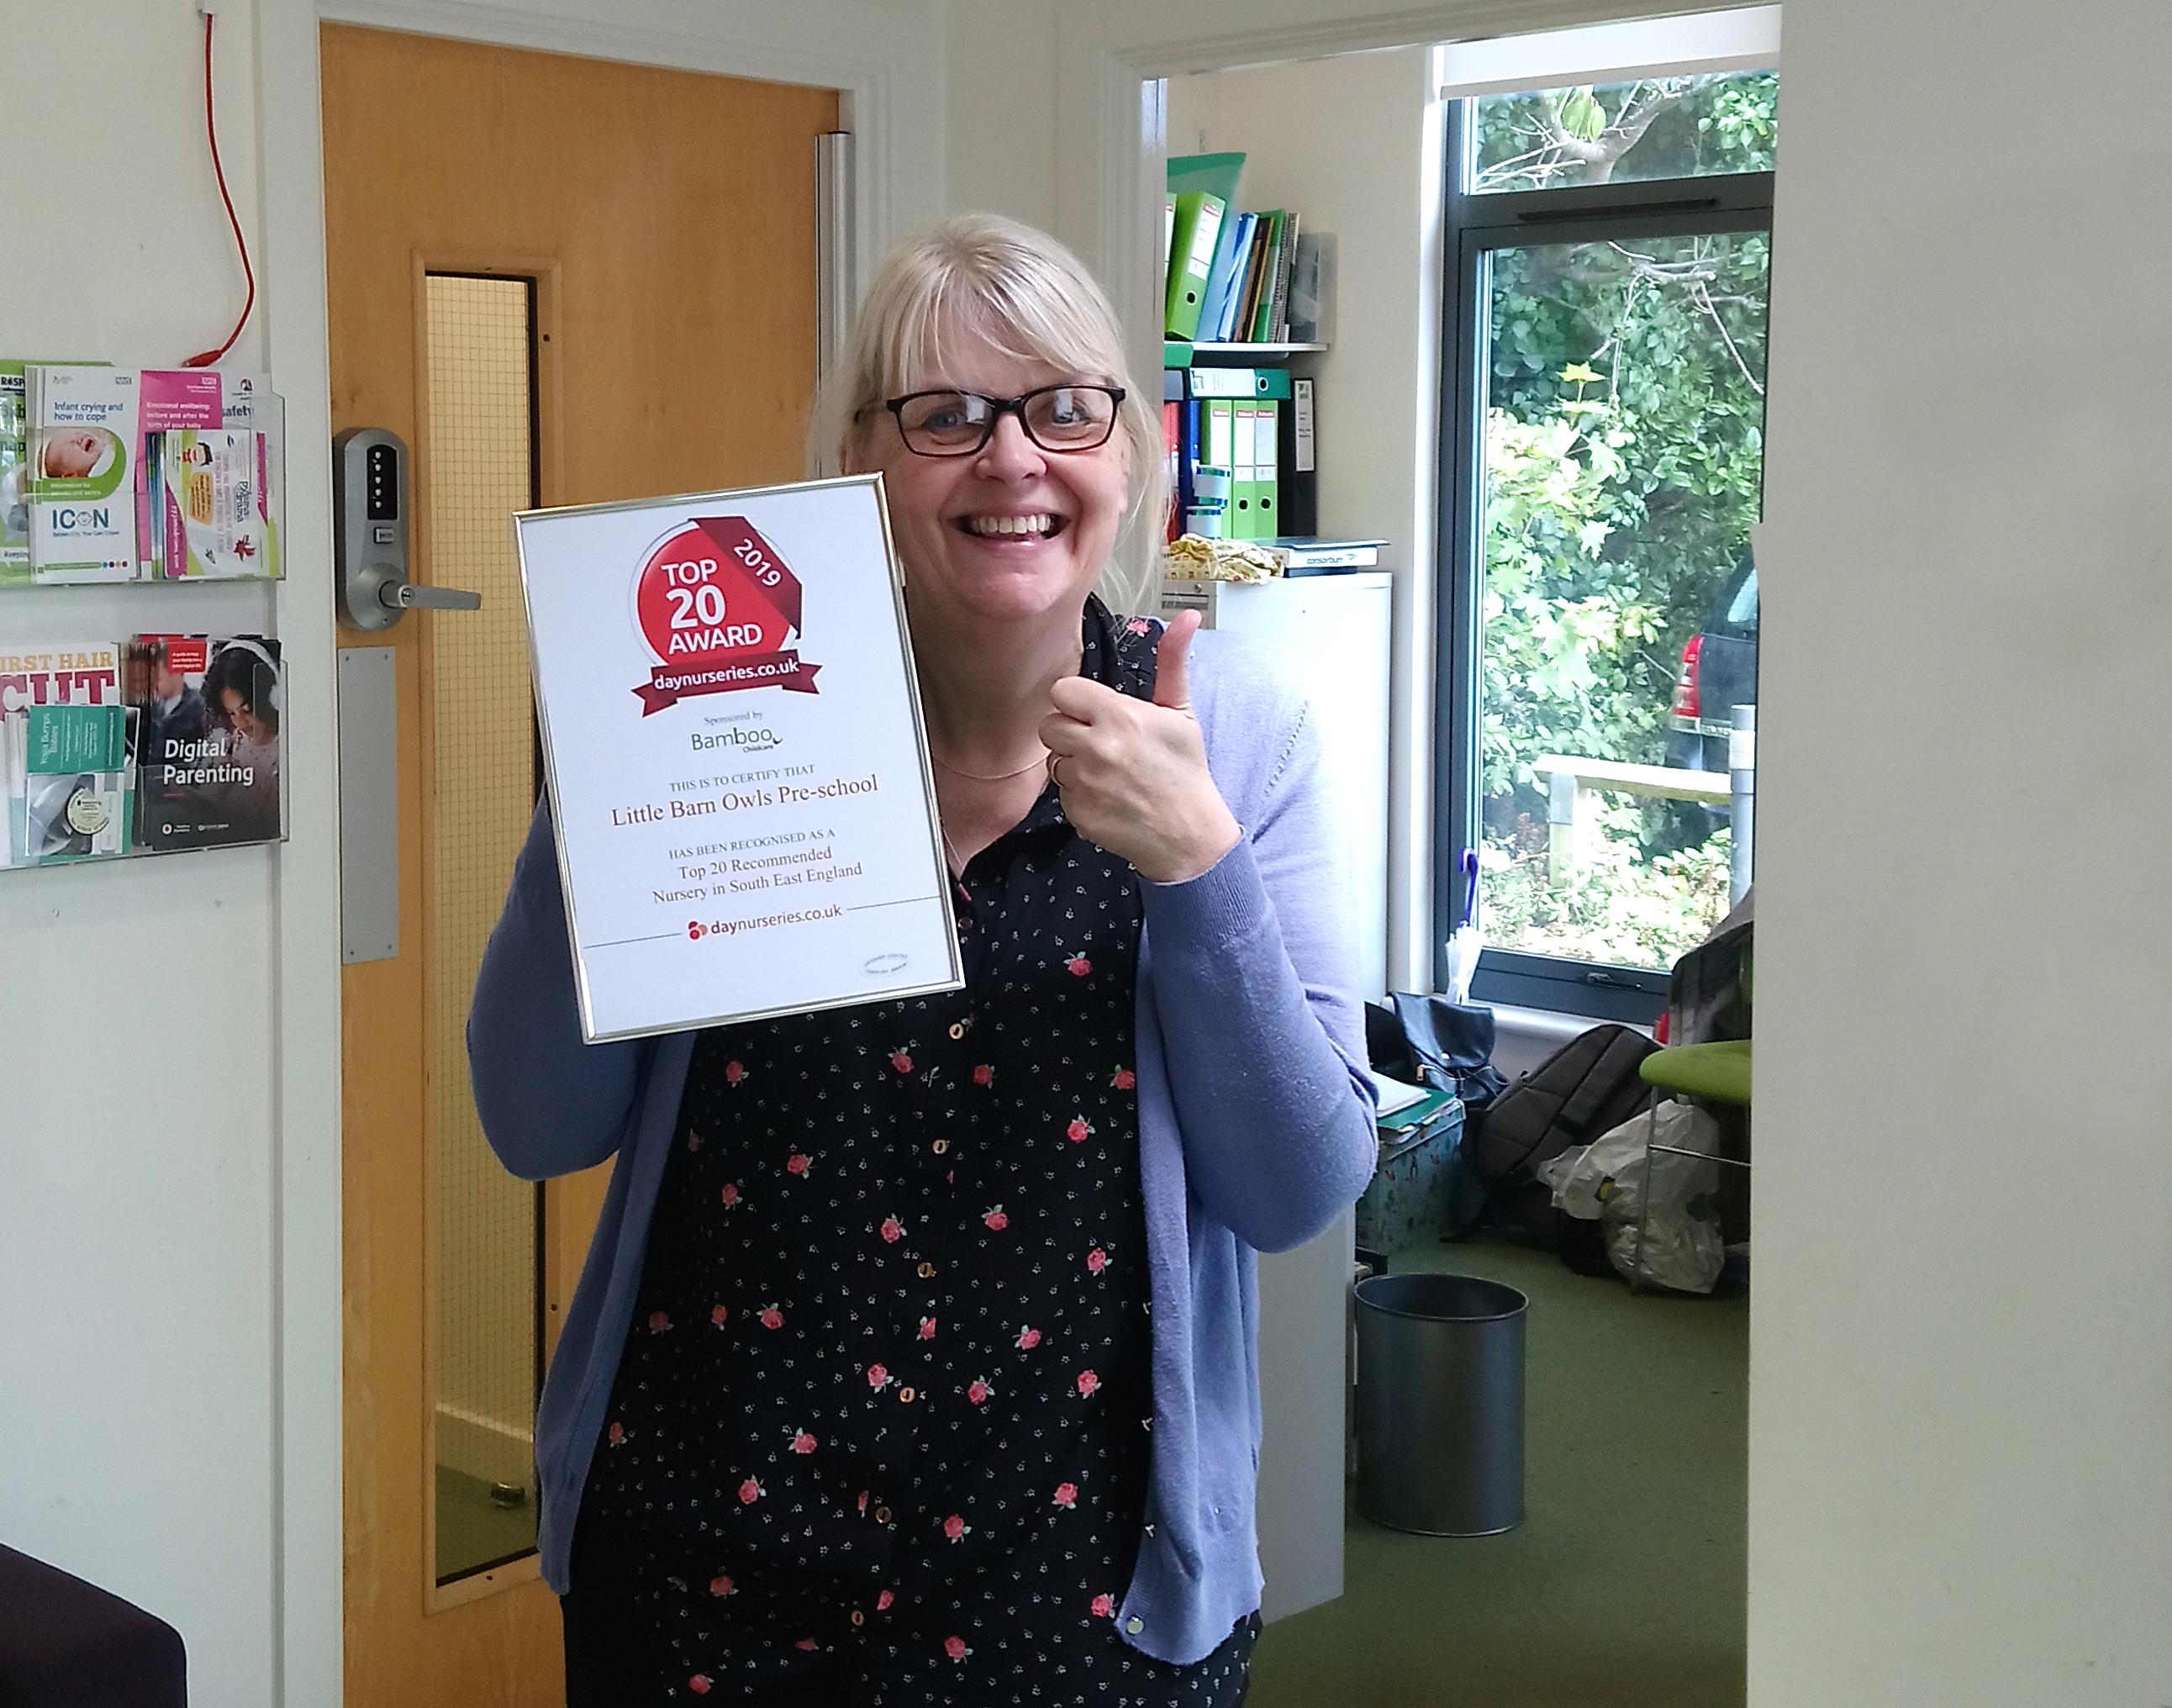 Little Barn Owls Award